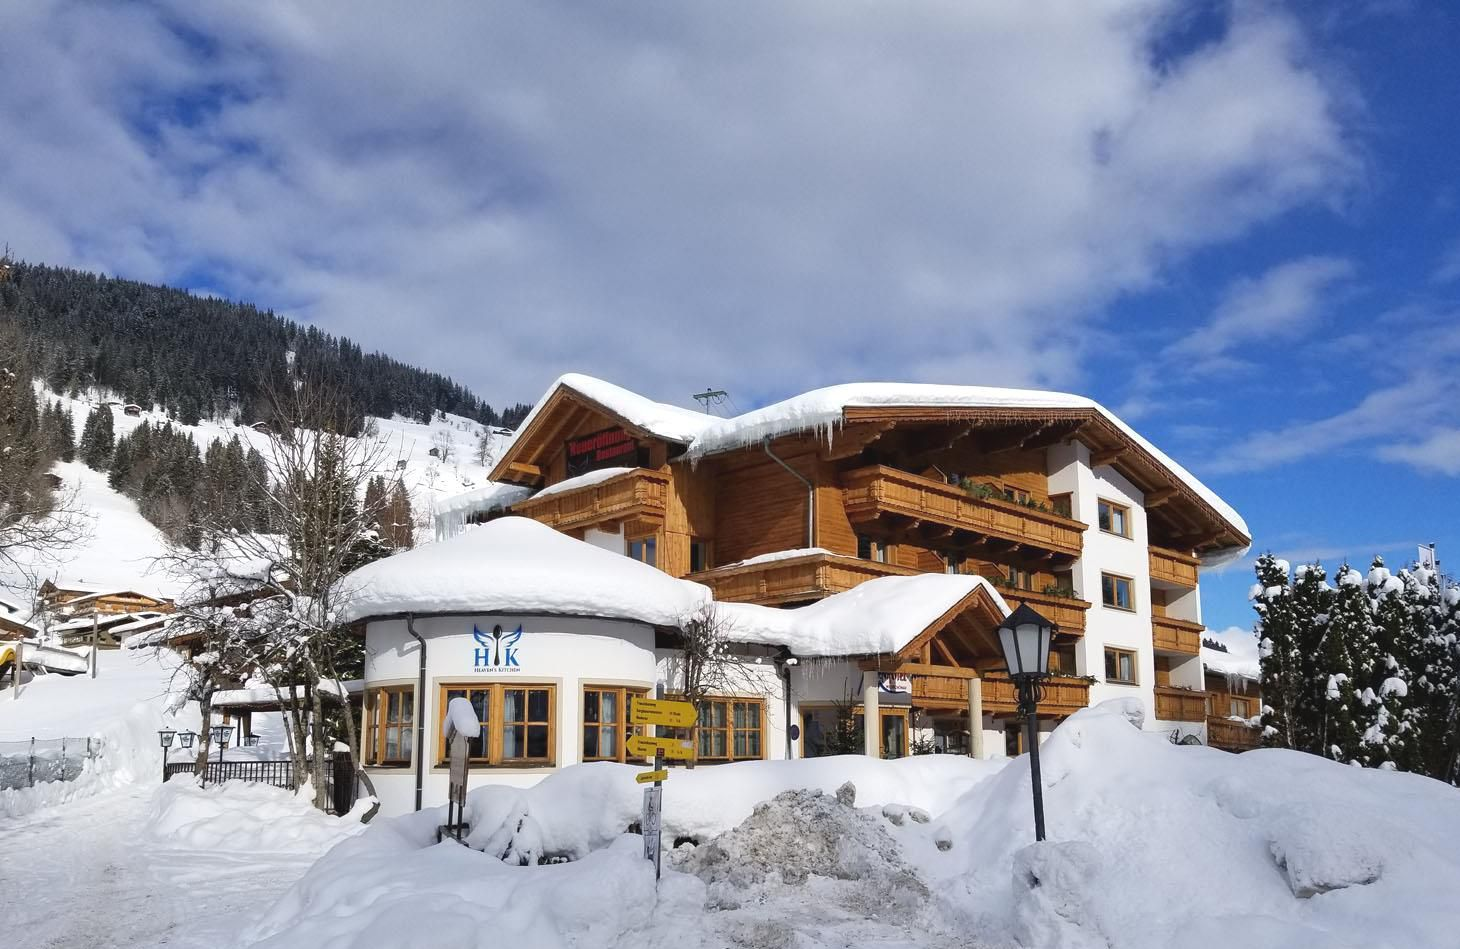 Slide1 - Alpenhotel Wildschonau